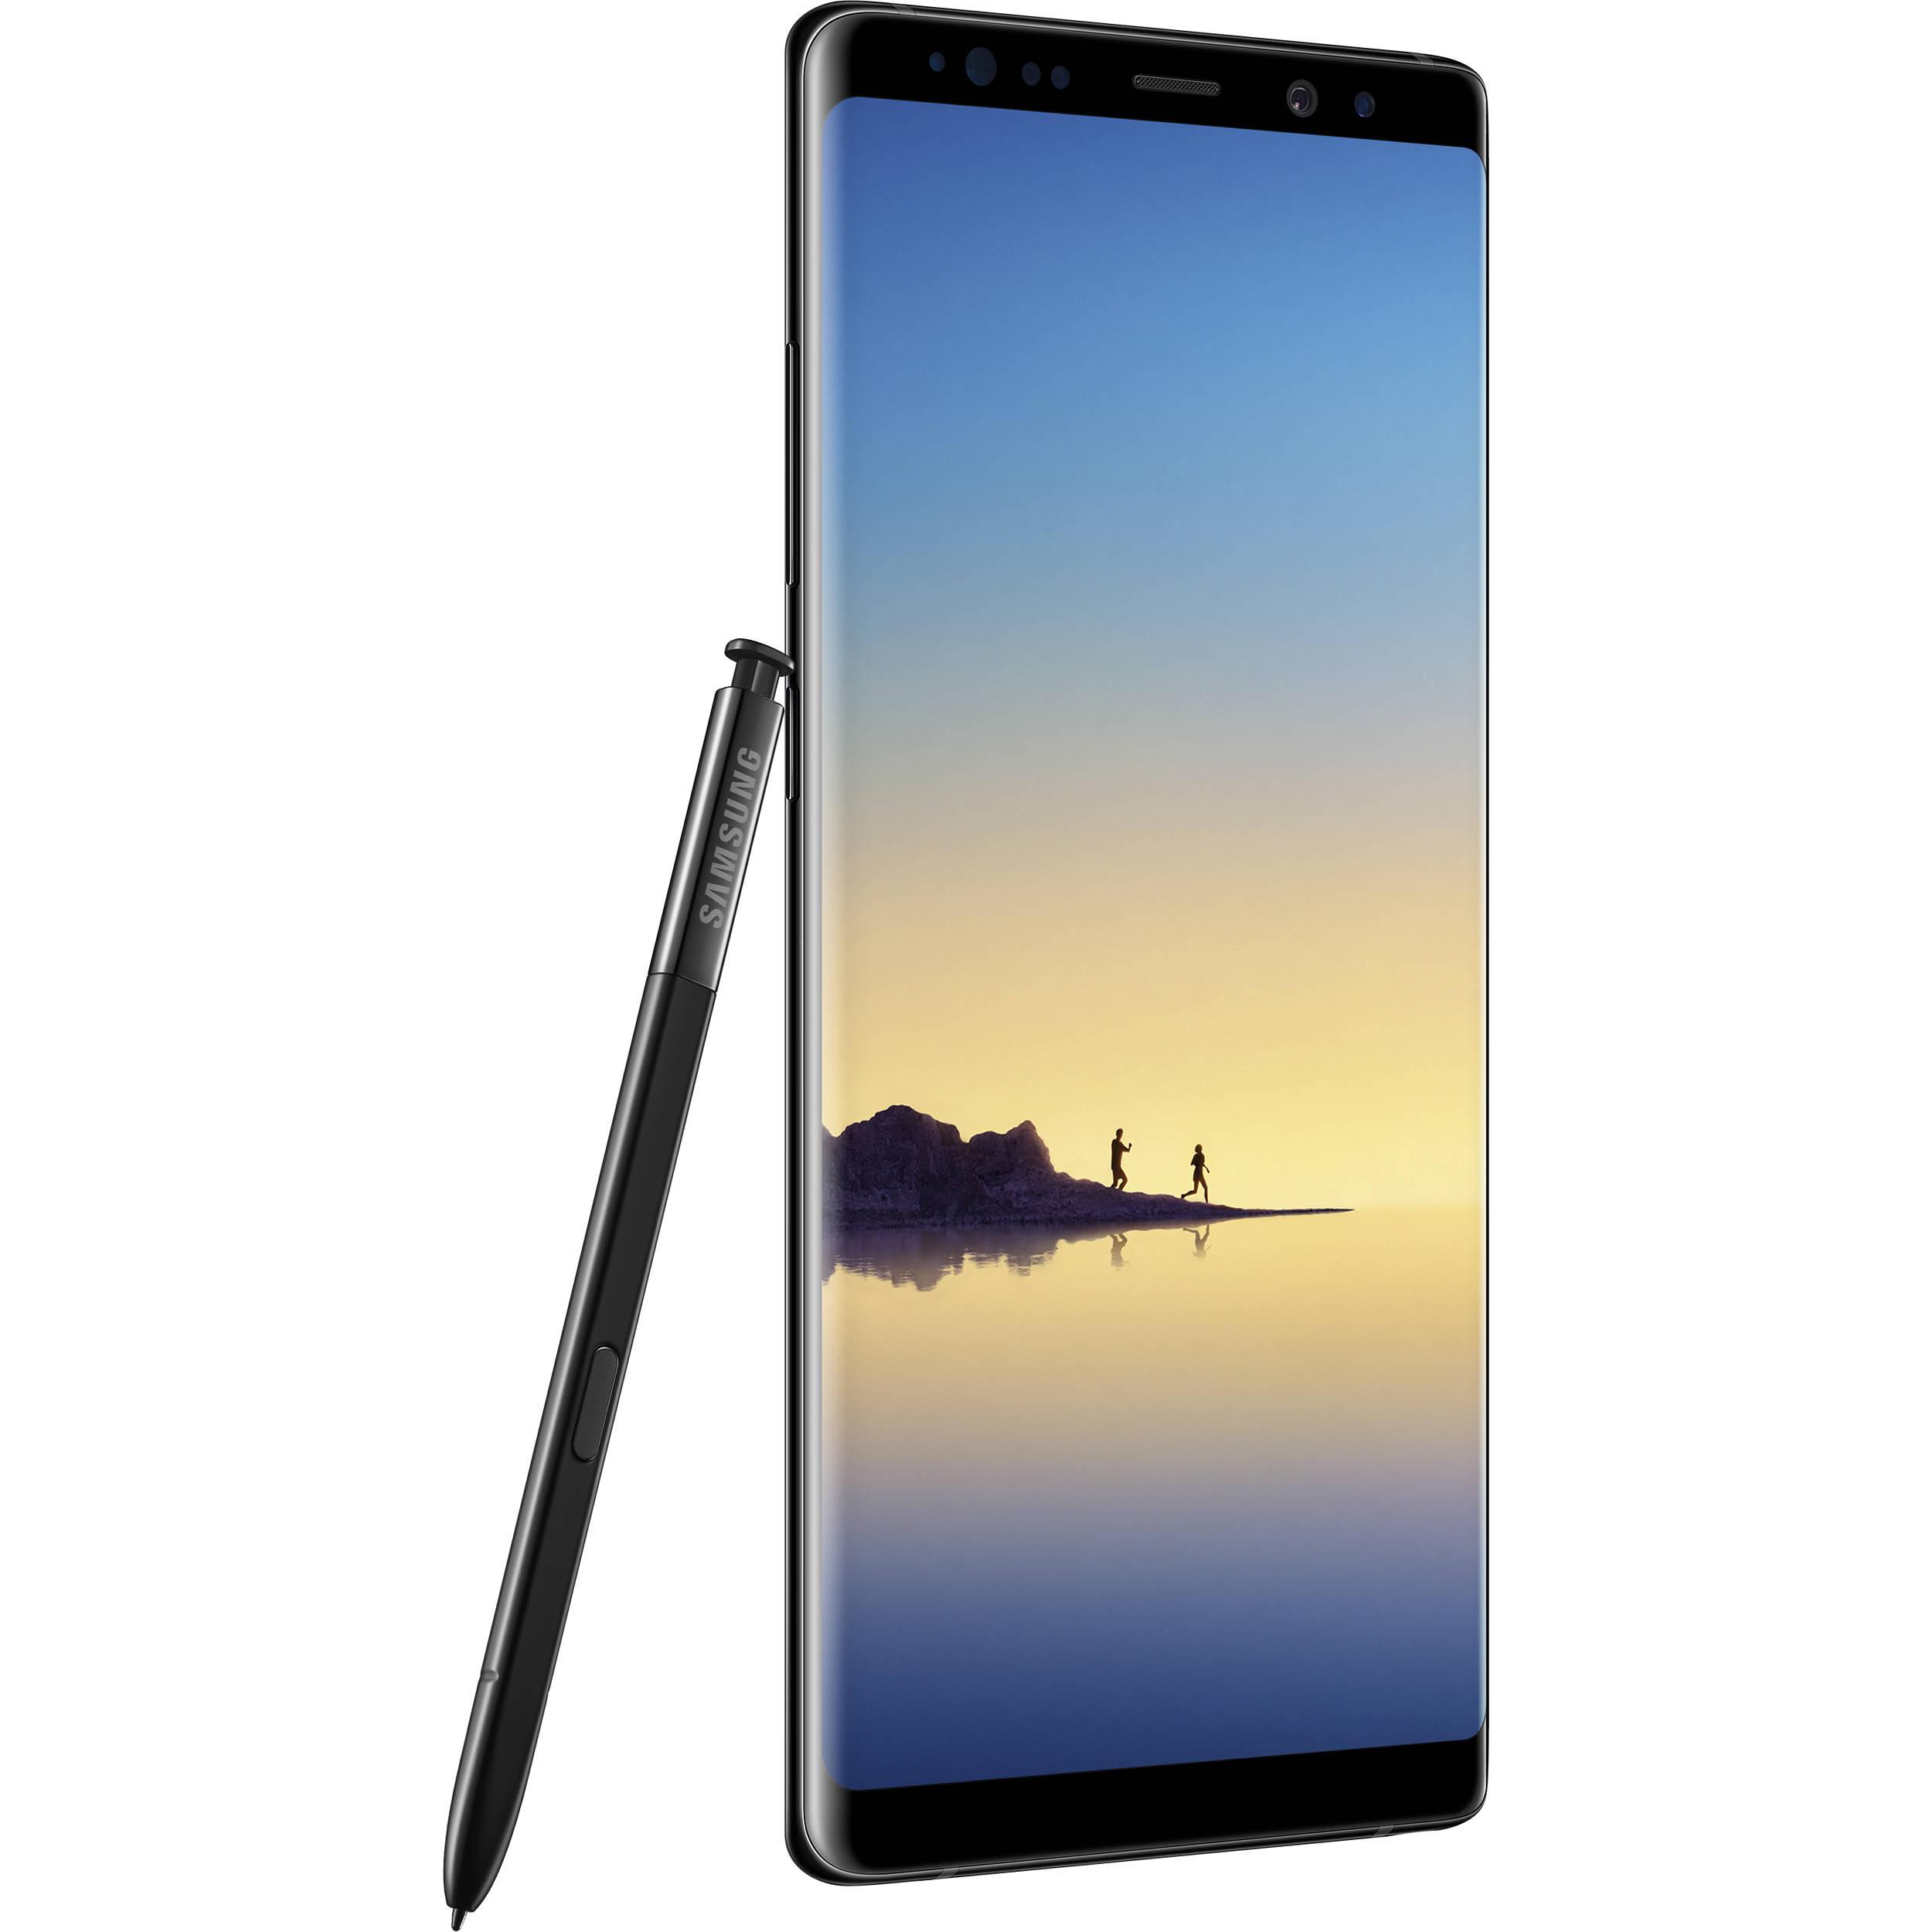 Note8 Black Smartphone Samsung Sm-n950f 64gb Midnight Galaxy Dual-sim unlocked